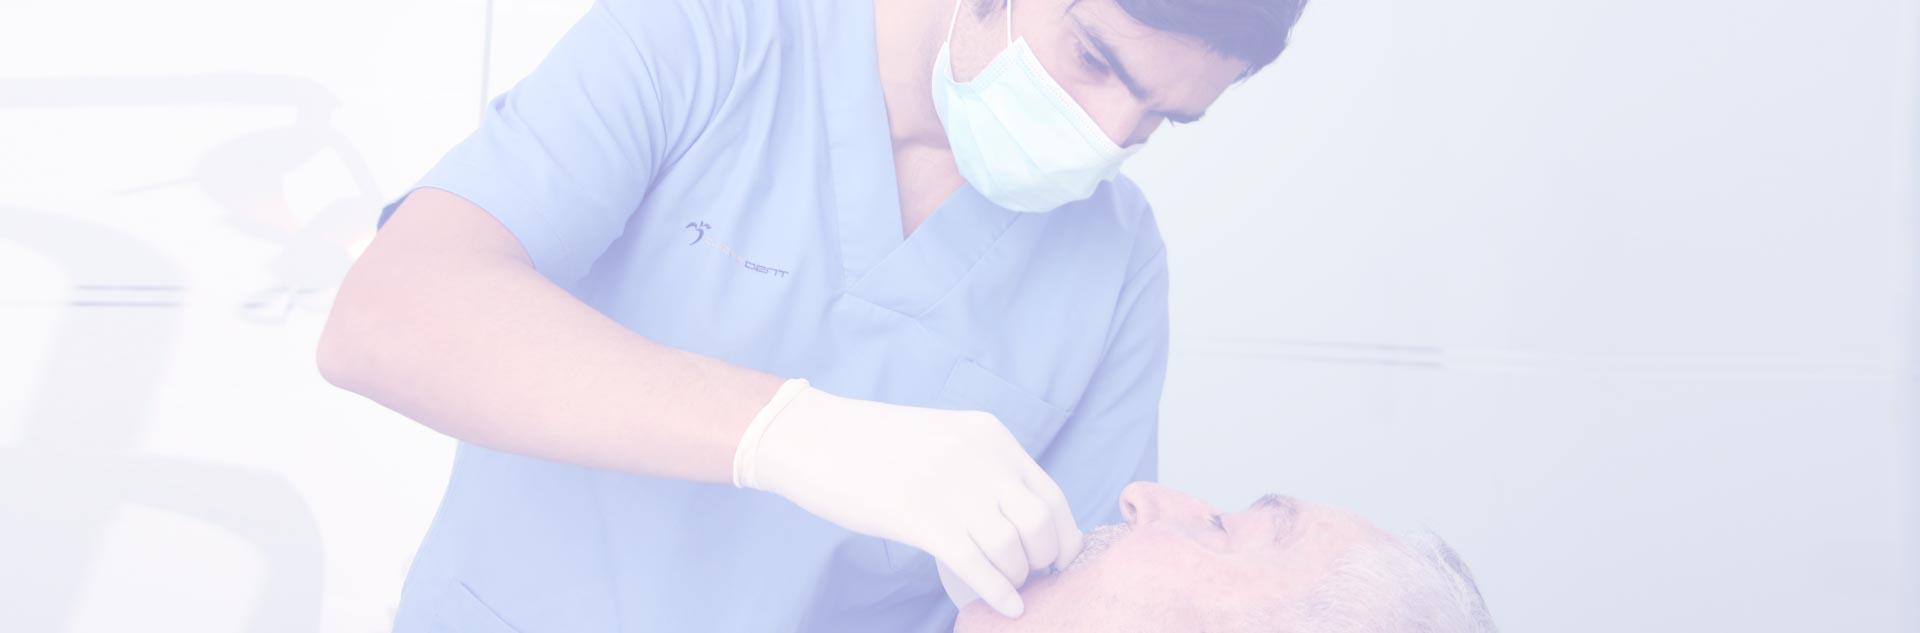 slide-implantologia-avanzada1